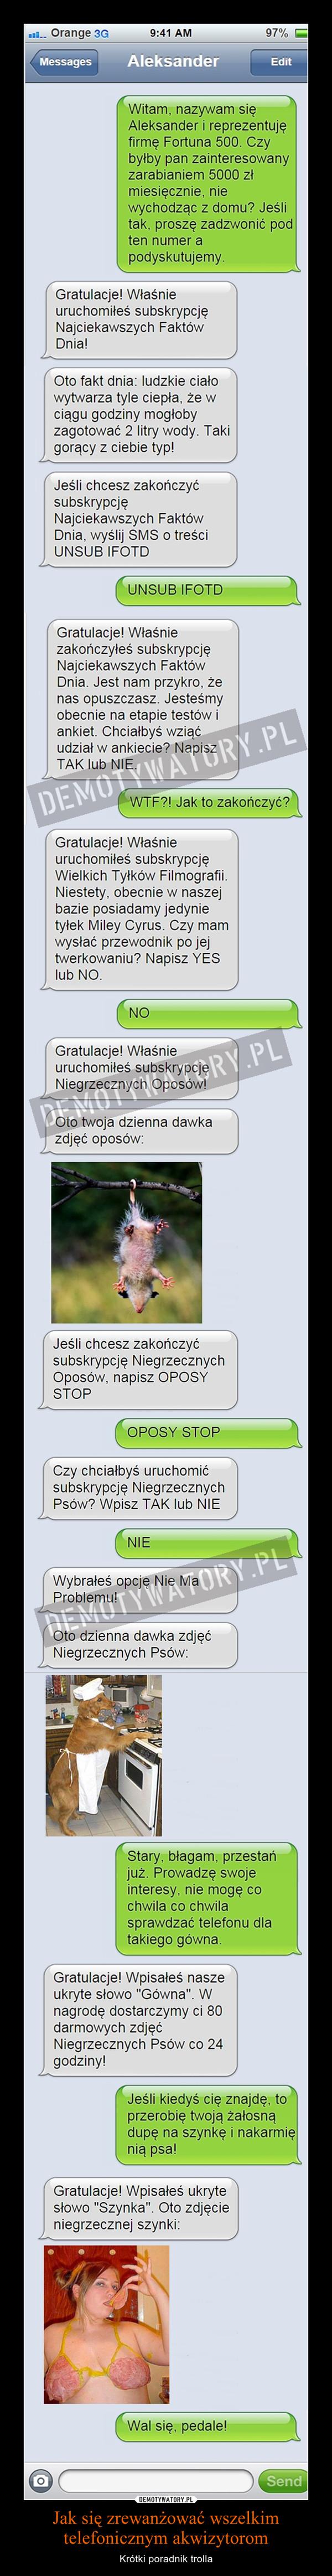 trolling SMS